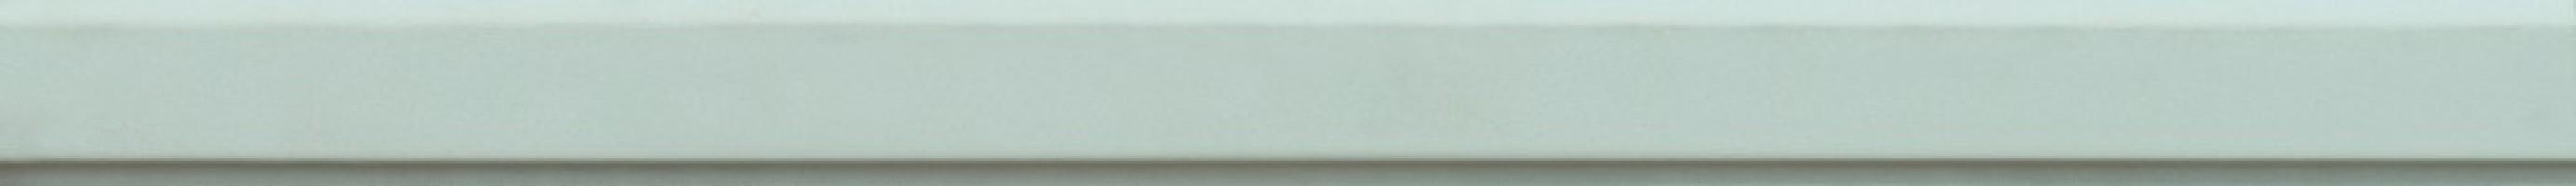 Бордюр Marca Corona Victoria Turquoise List 3x40 I006